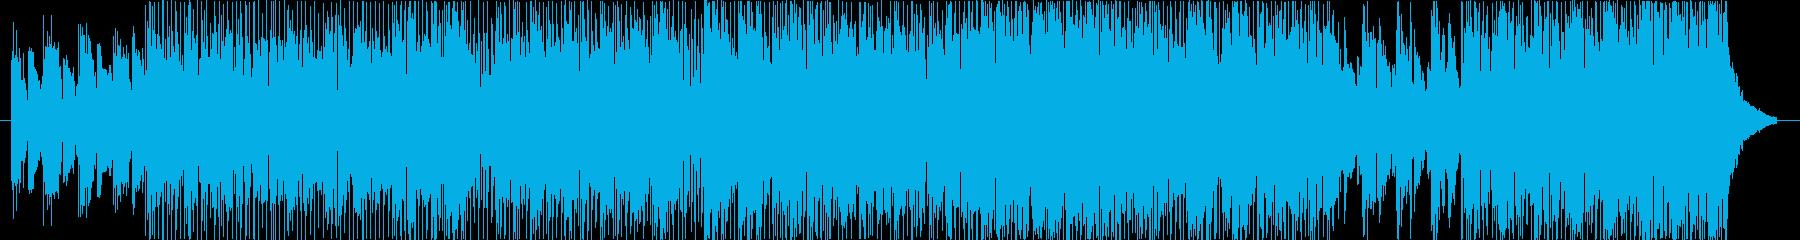 White And Blueの再生済みの波形